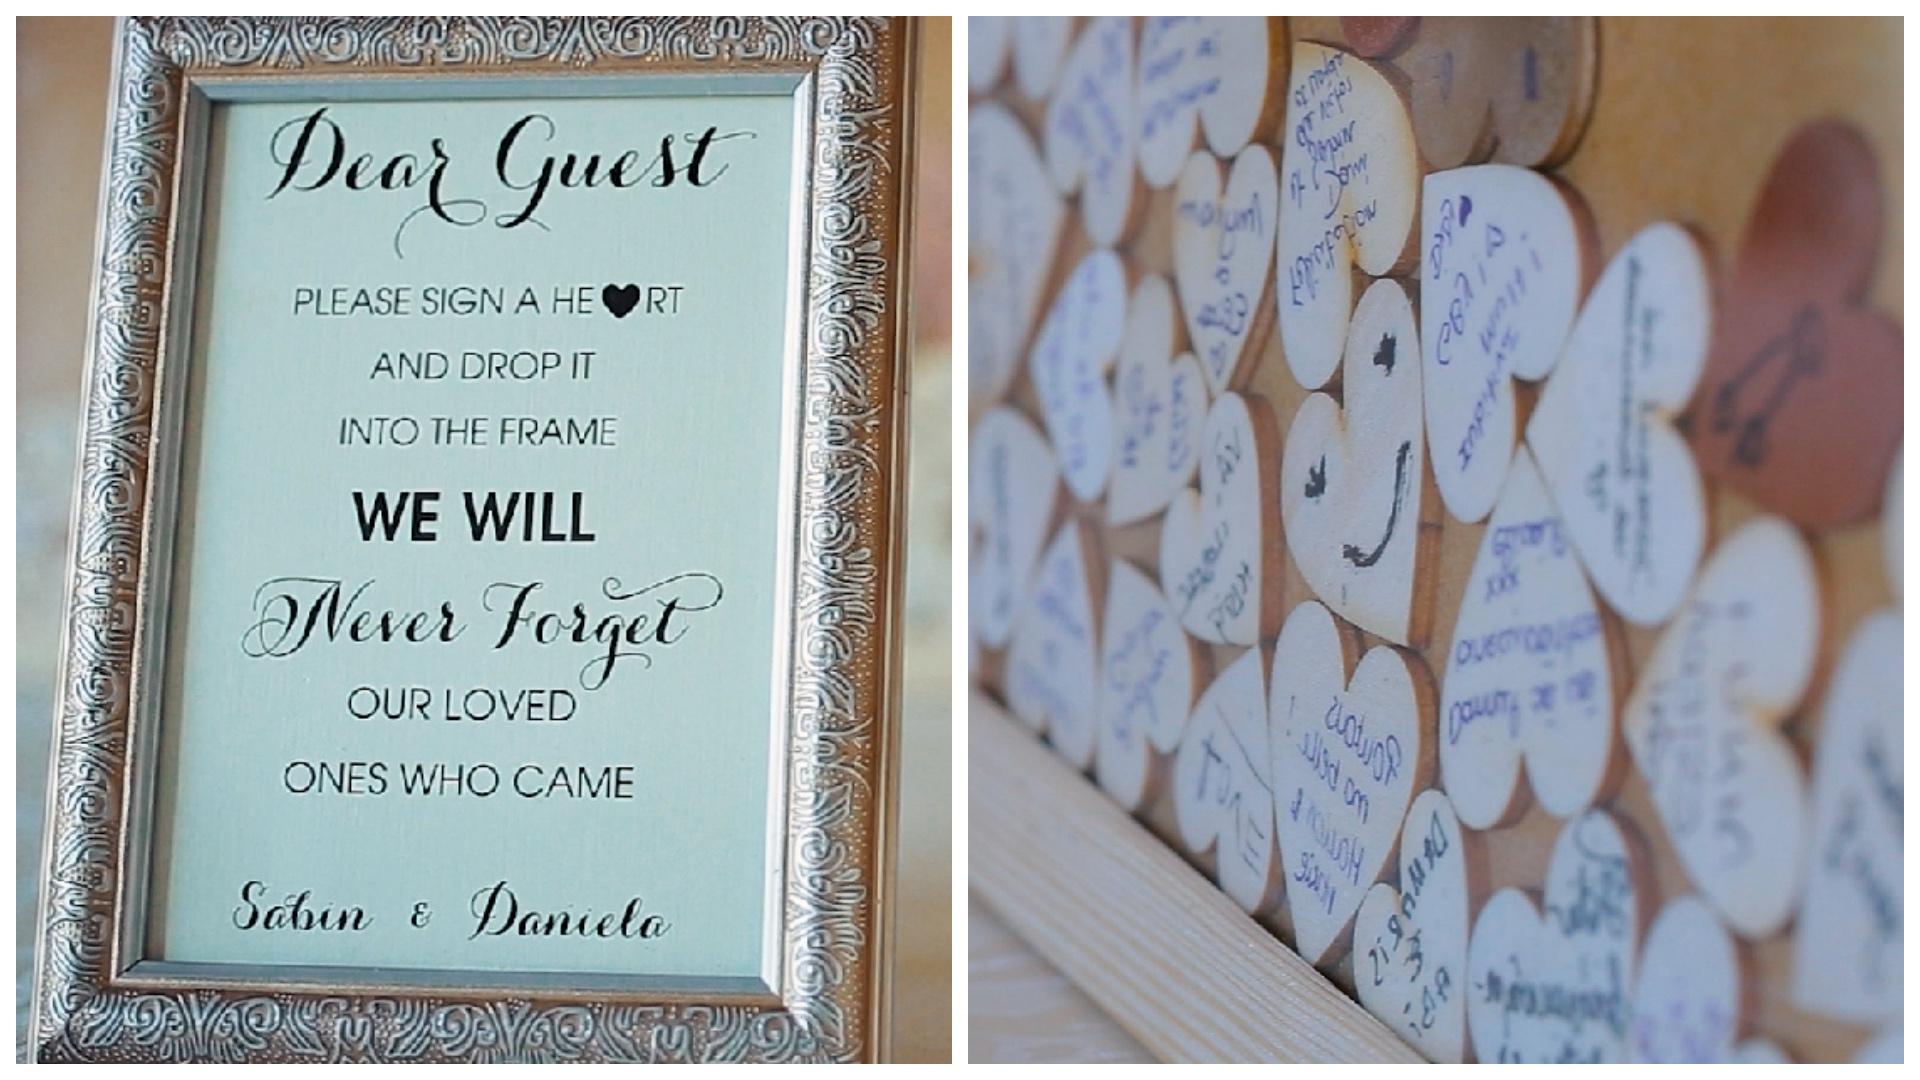 Creative wedding ideas for Baptist wedding